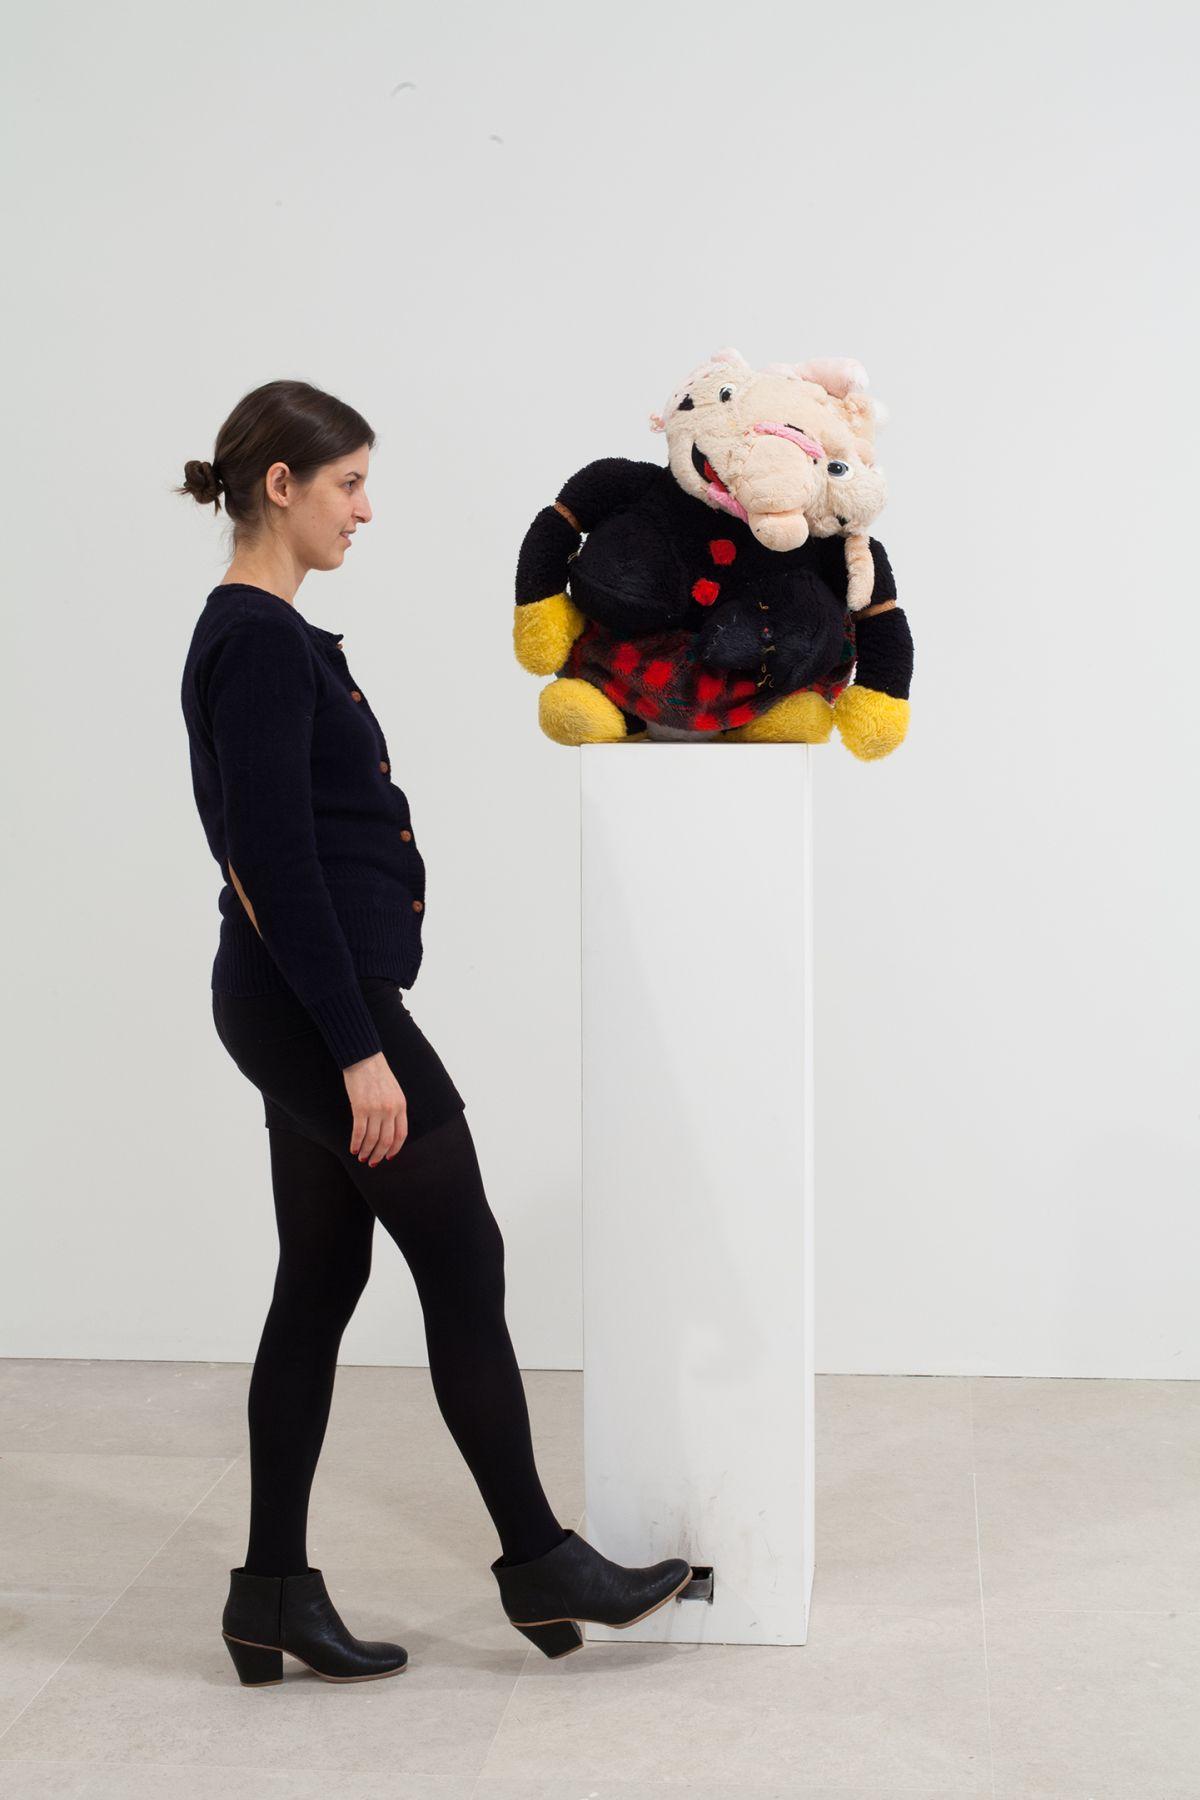 Gelitin, Emma, 2012, Mixed media, 70 x 19 1/2 x 16 1/2 inches